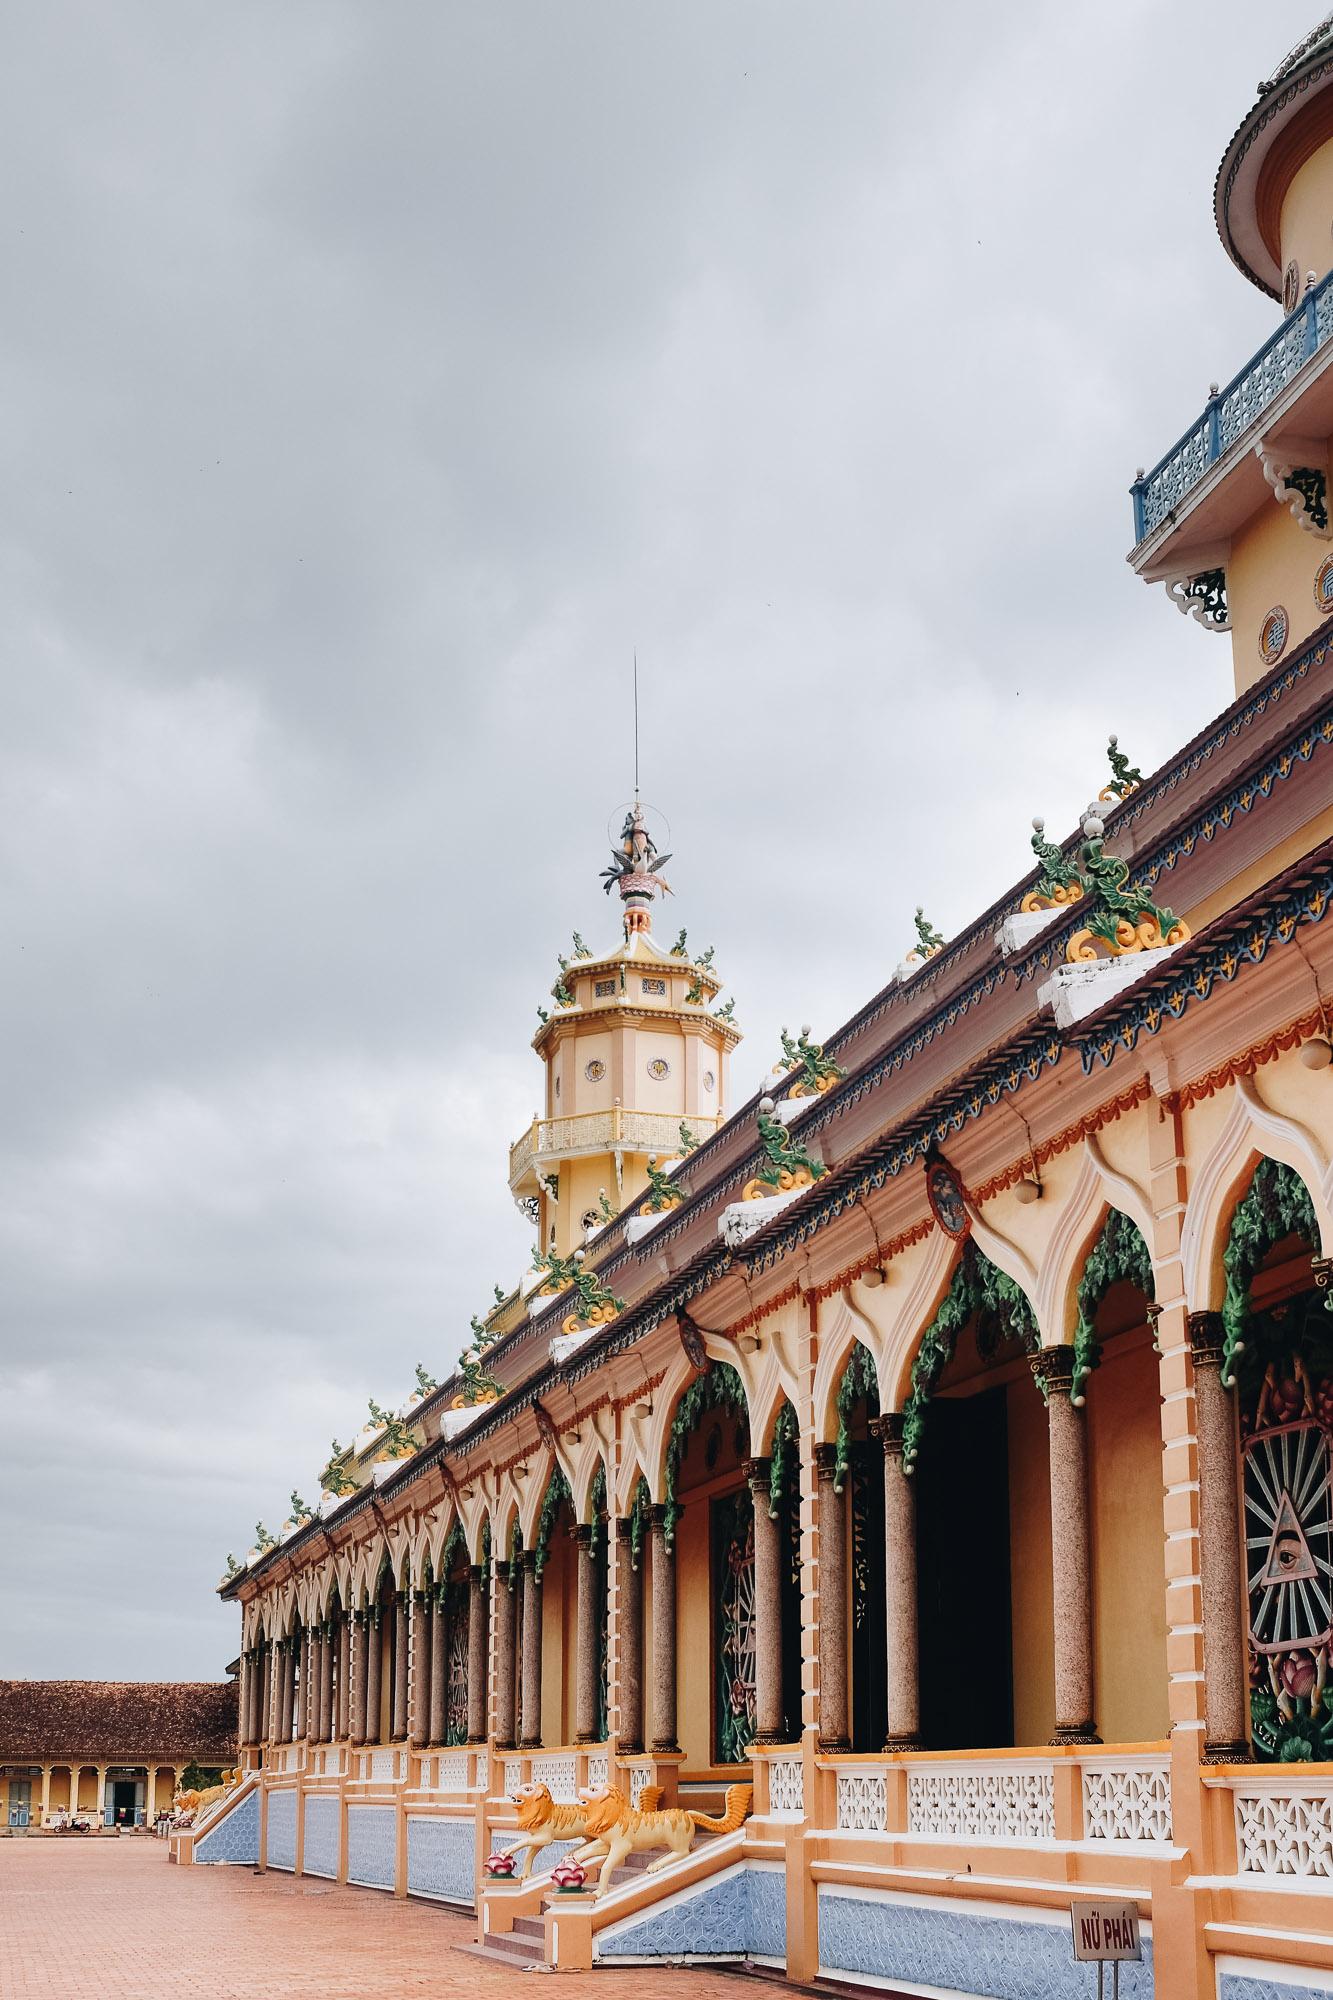 OTH_4557_2017, Cao Dai Holy See, Vietnam.jpg